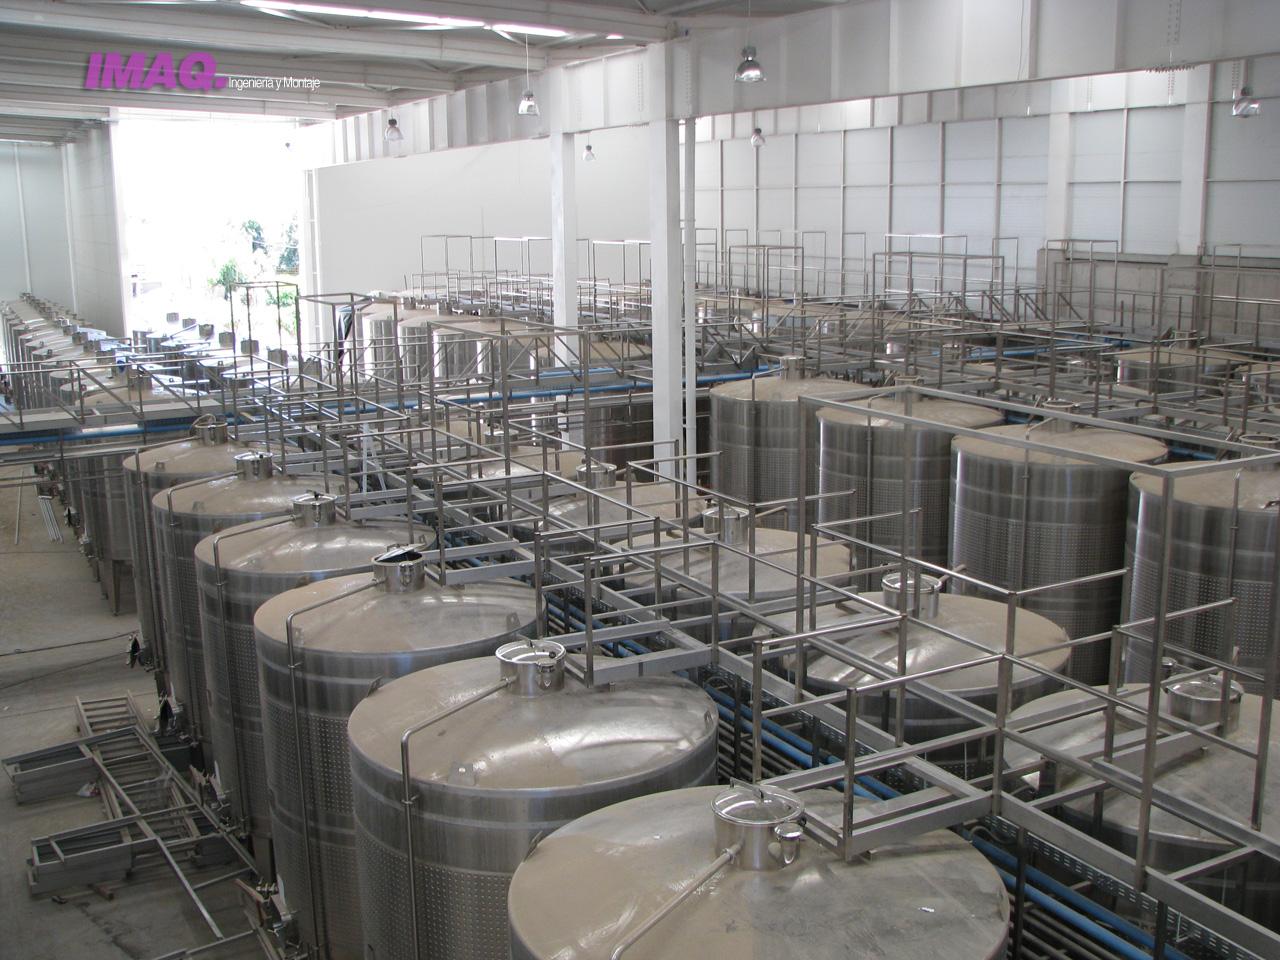 Lapostol imaq ingenier a for Fabricacion de estanques